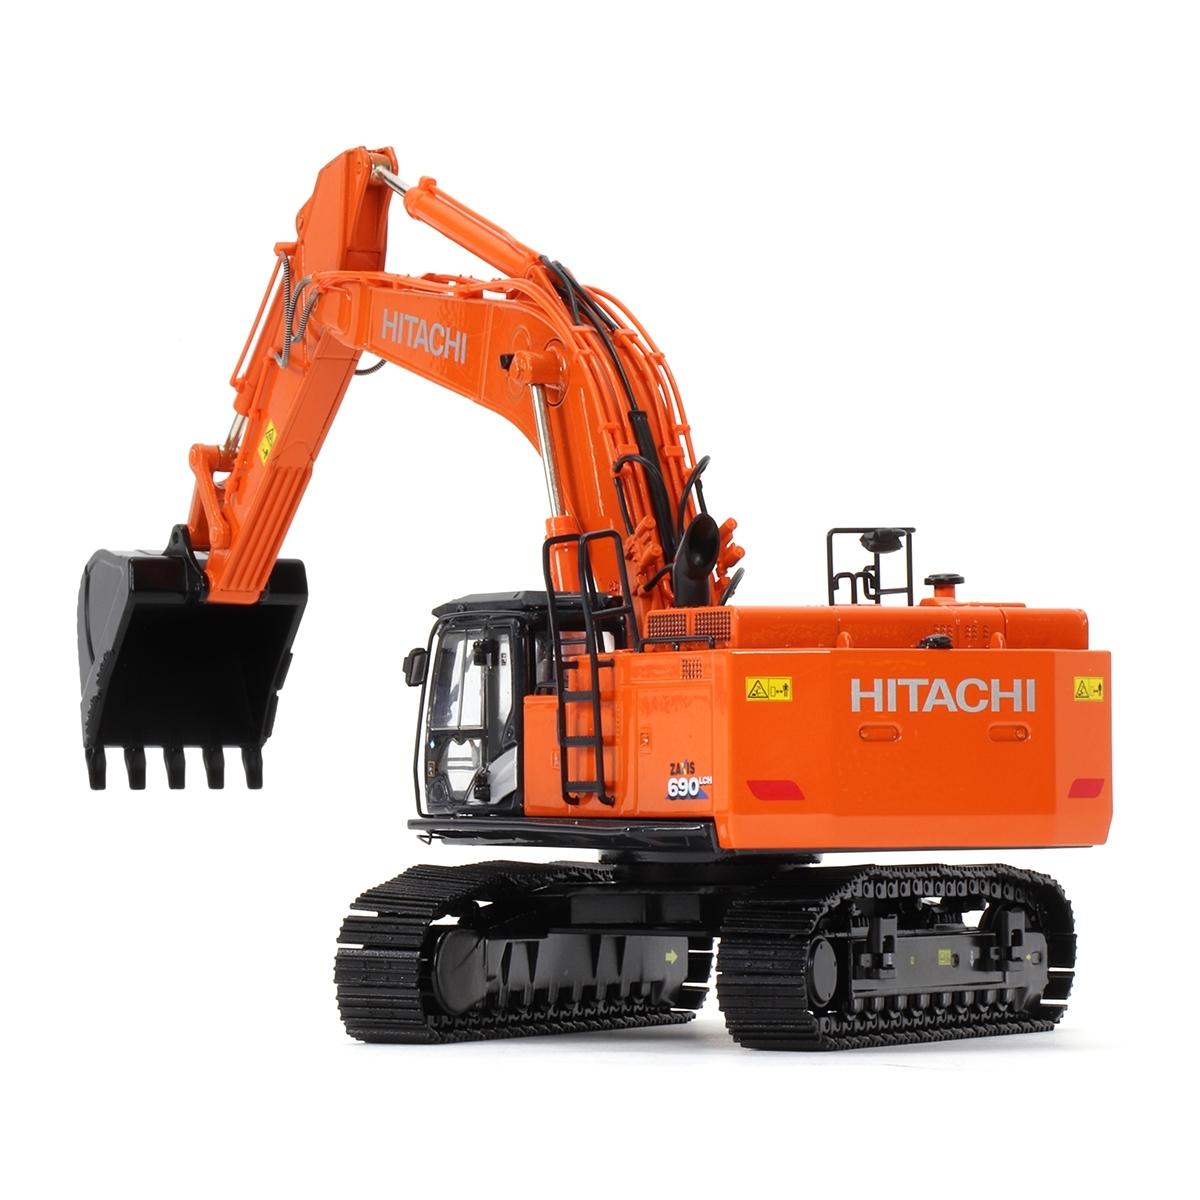 Hitachi ZX690LCH-6 Hydraulic excavator